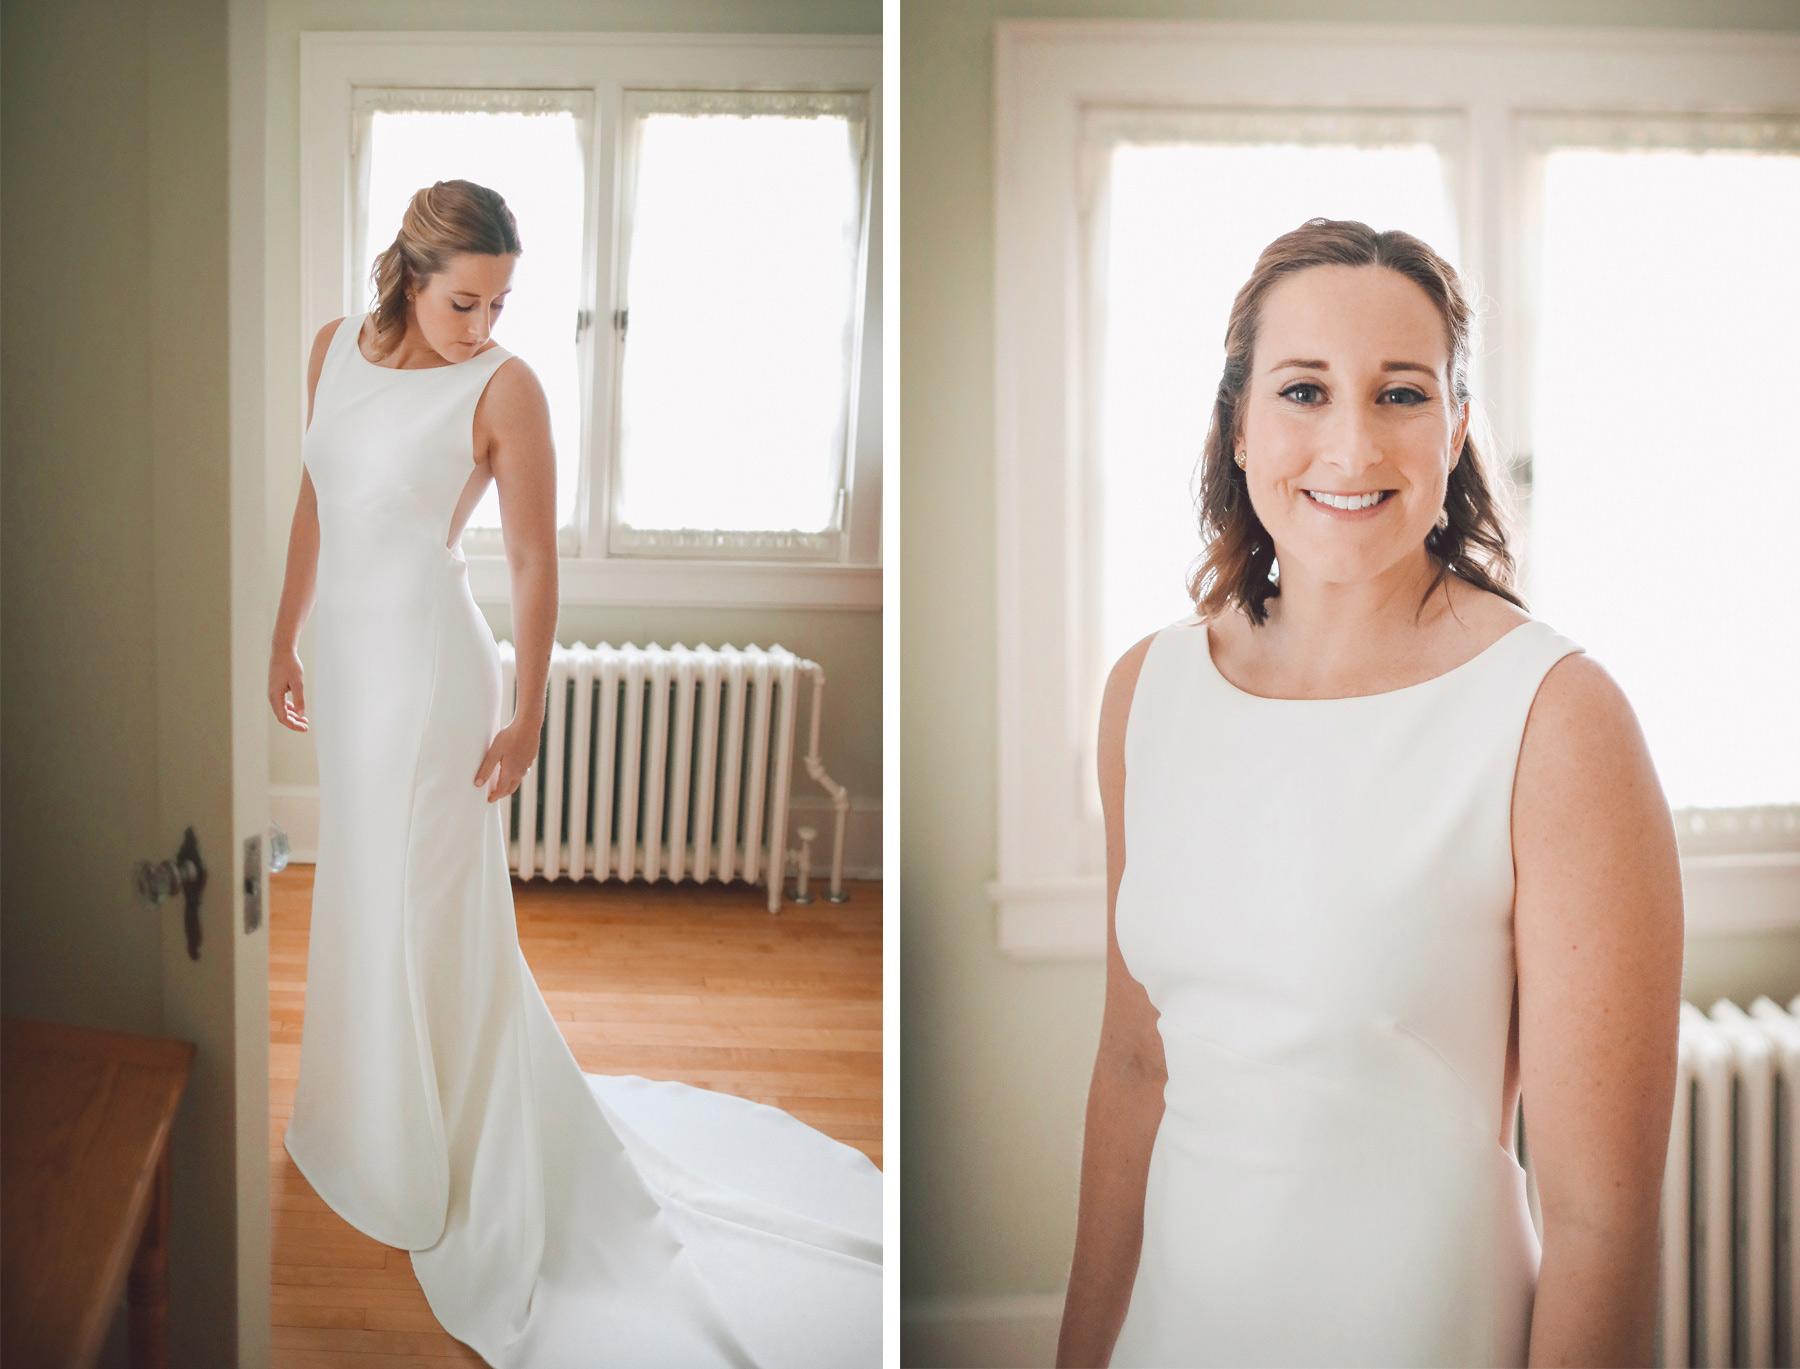 03-Saint-Paul-Minnesota-Wedding-Photographer-by-Andrew-Vick-Photography-Fall-Autumn-Parents-House-Getting-Ready-Bride-Dress-Vintage-Kathryn-and-Sam.jpg